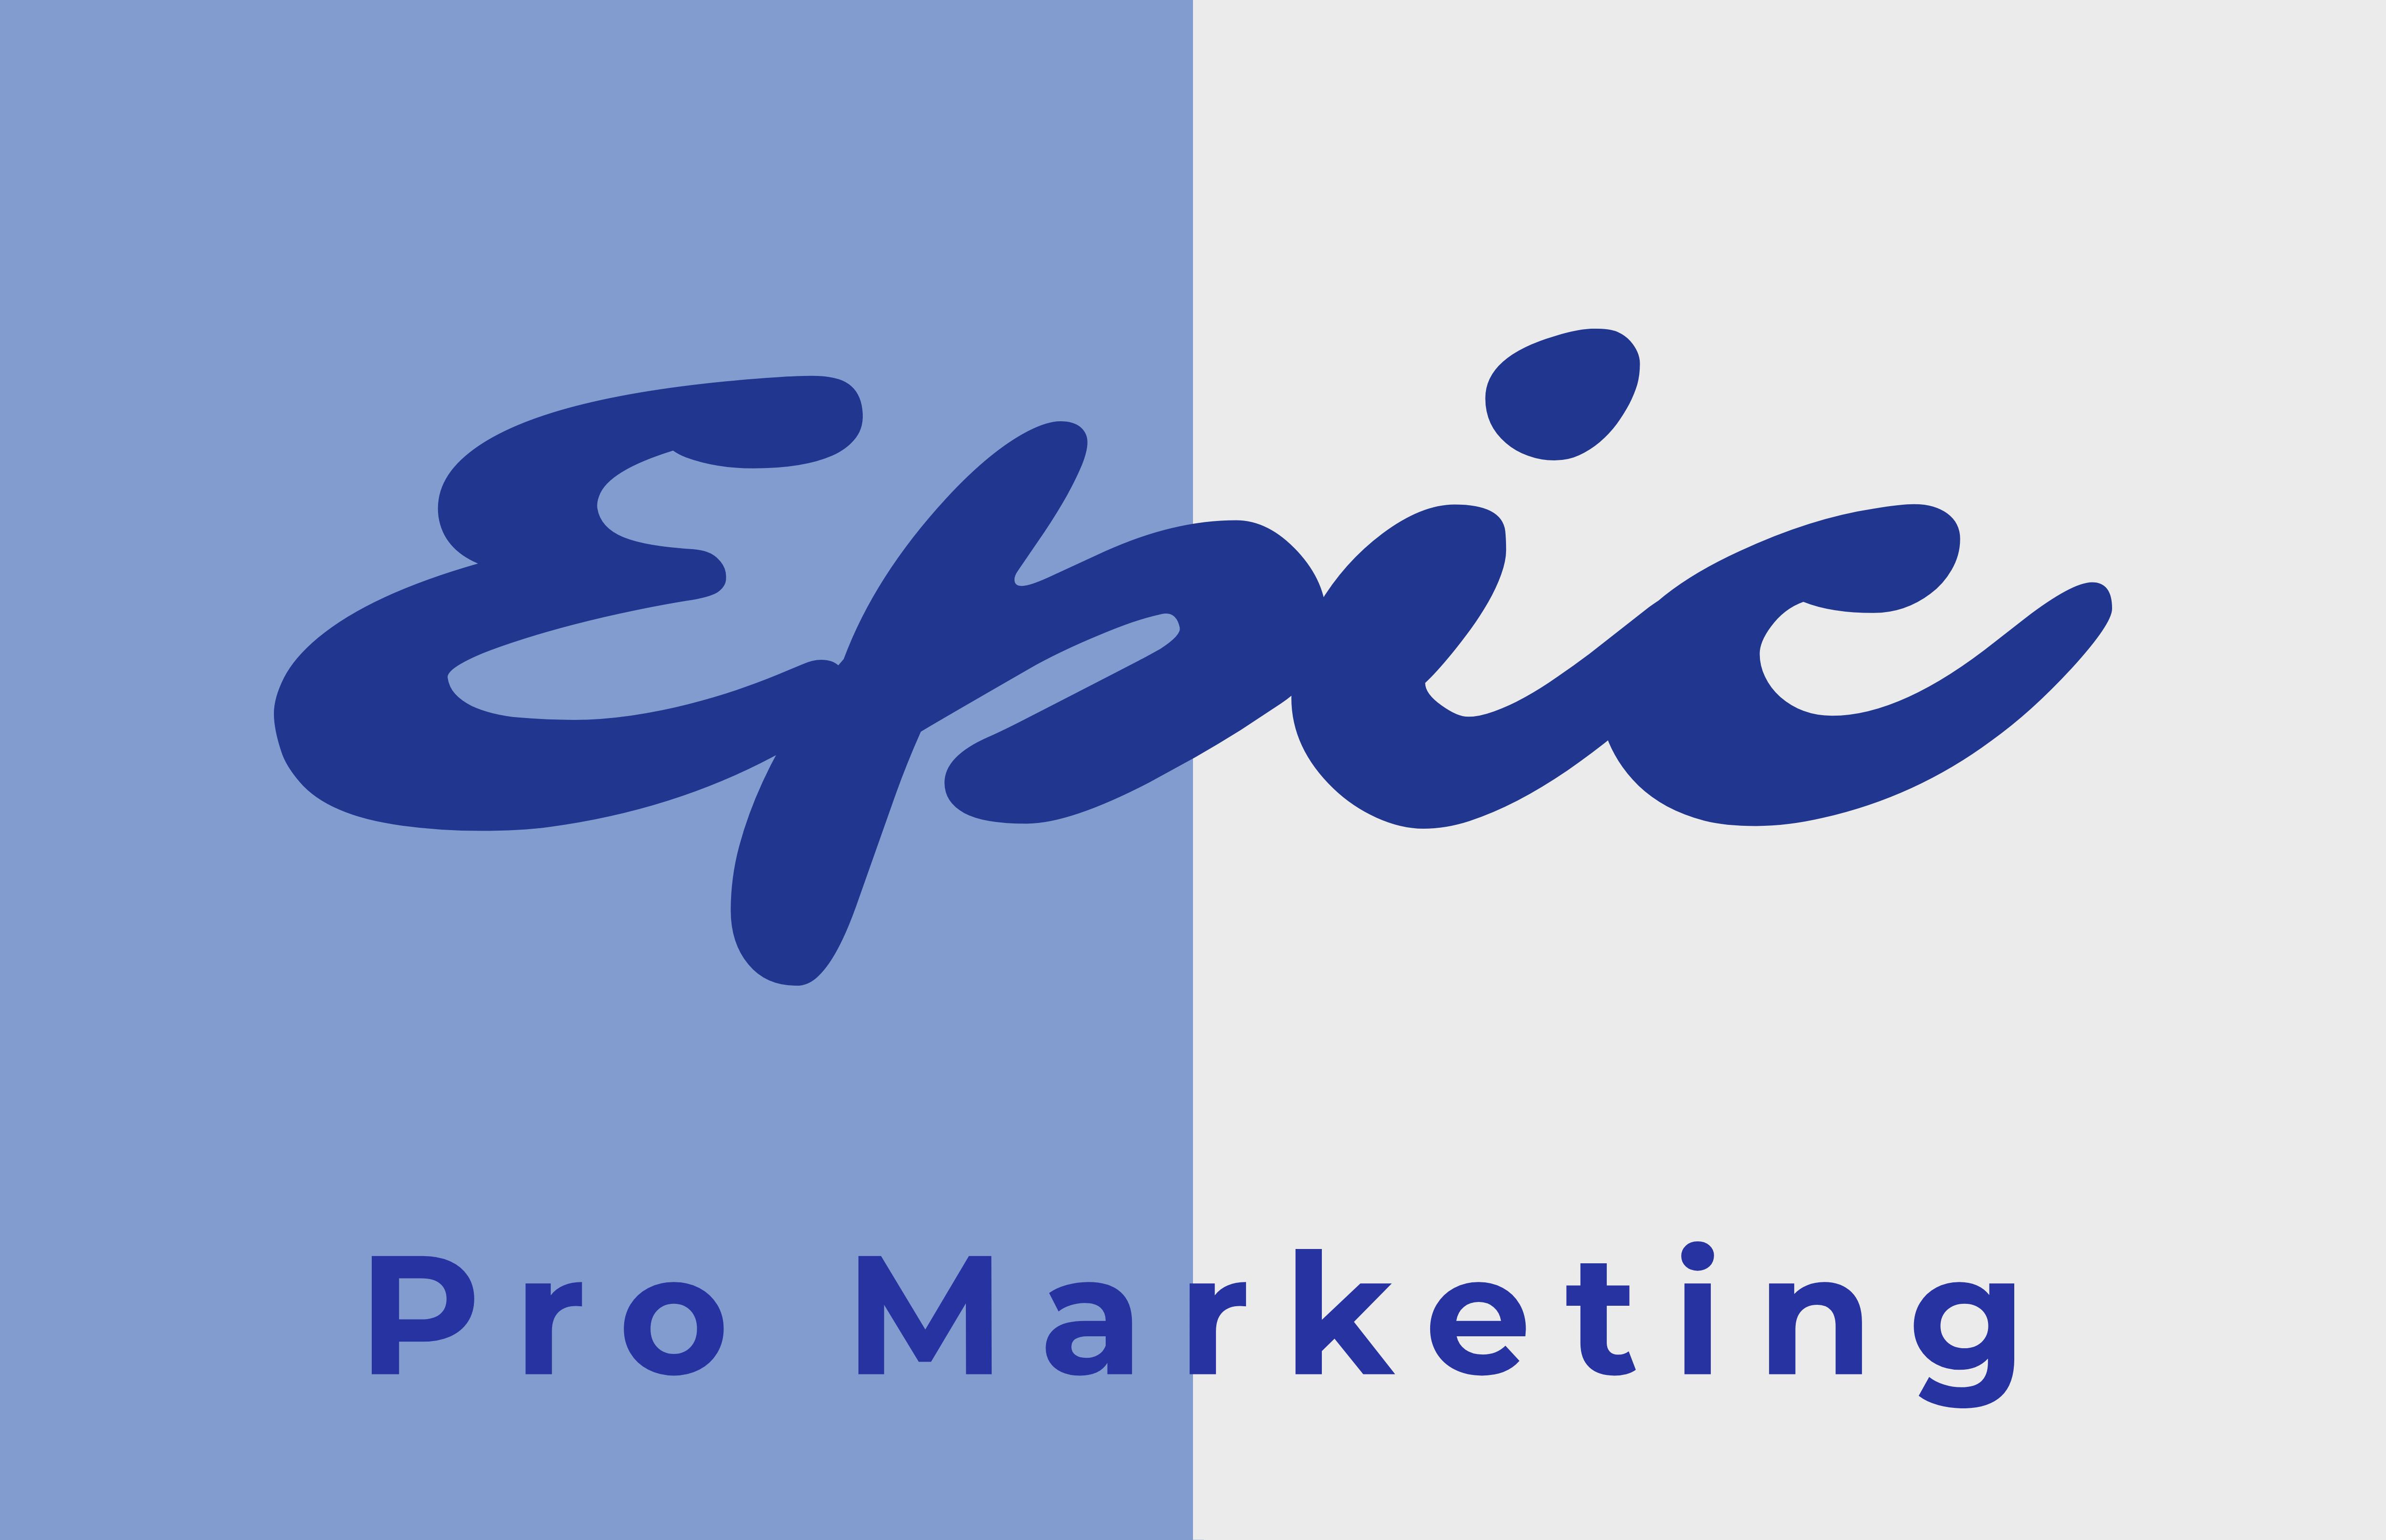 Epic Pro Marketing, a chatbot developer